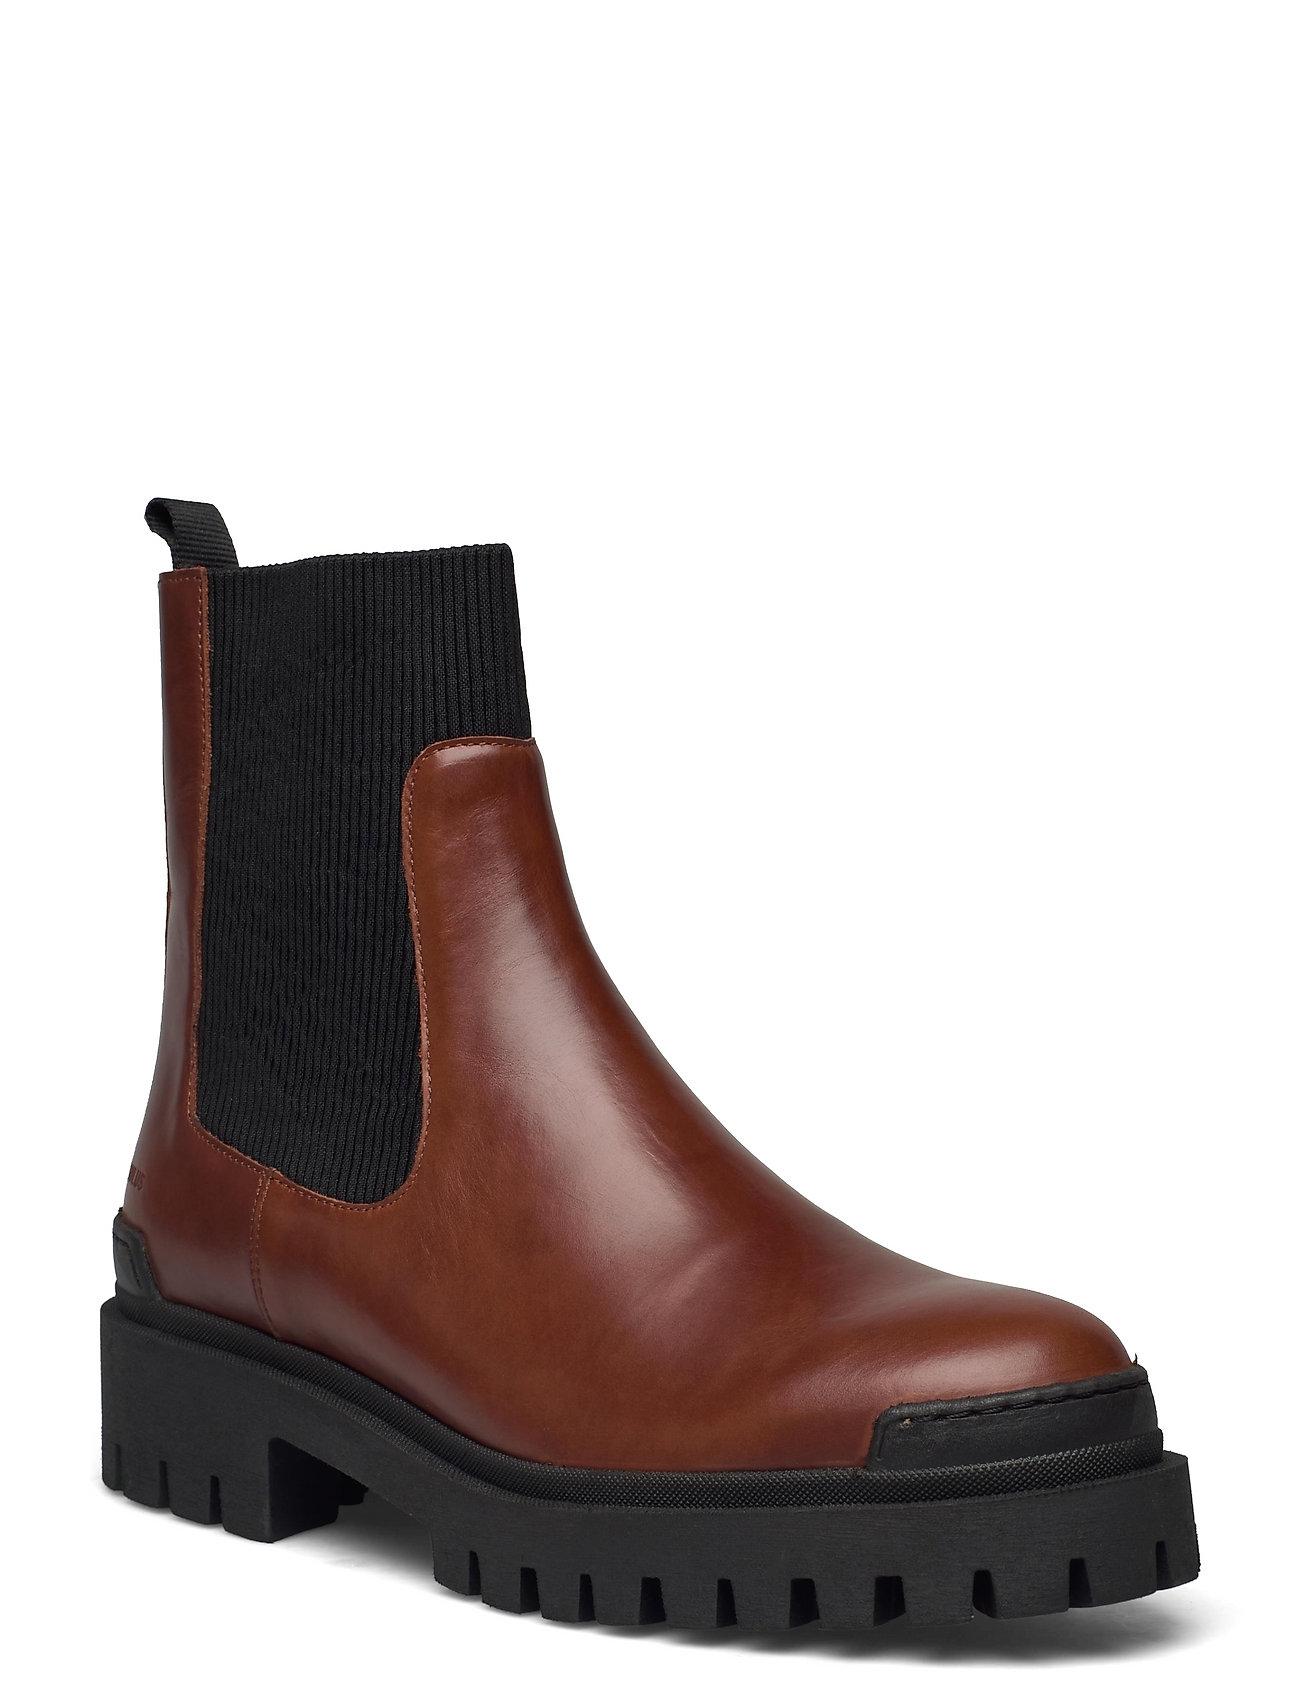 Boots - Flat Shoes Chelsea Boots Brun ANGULUS